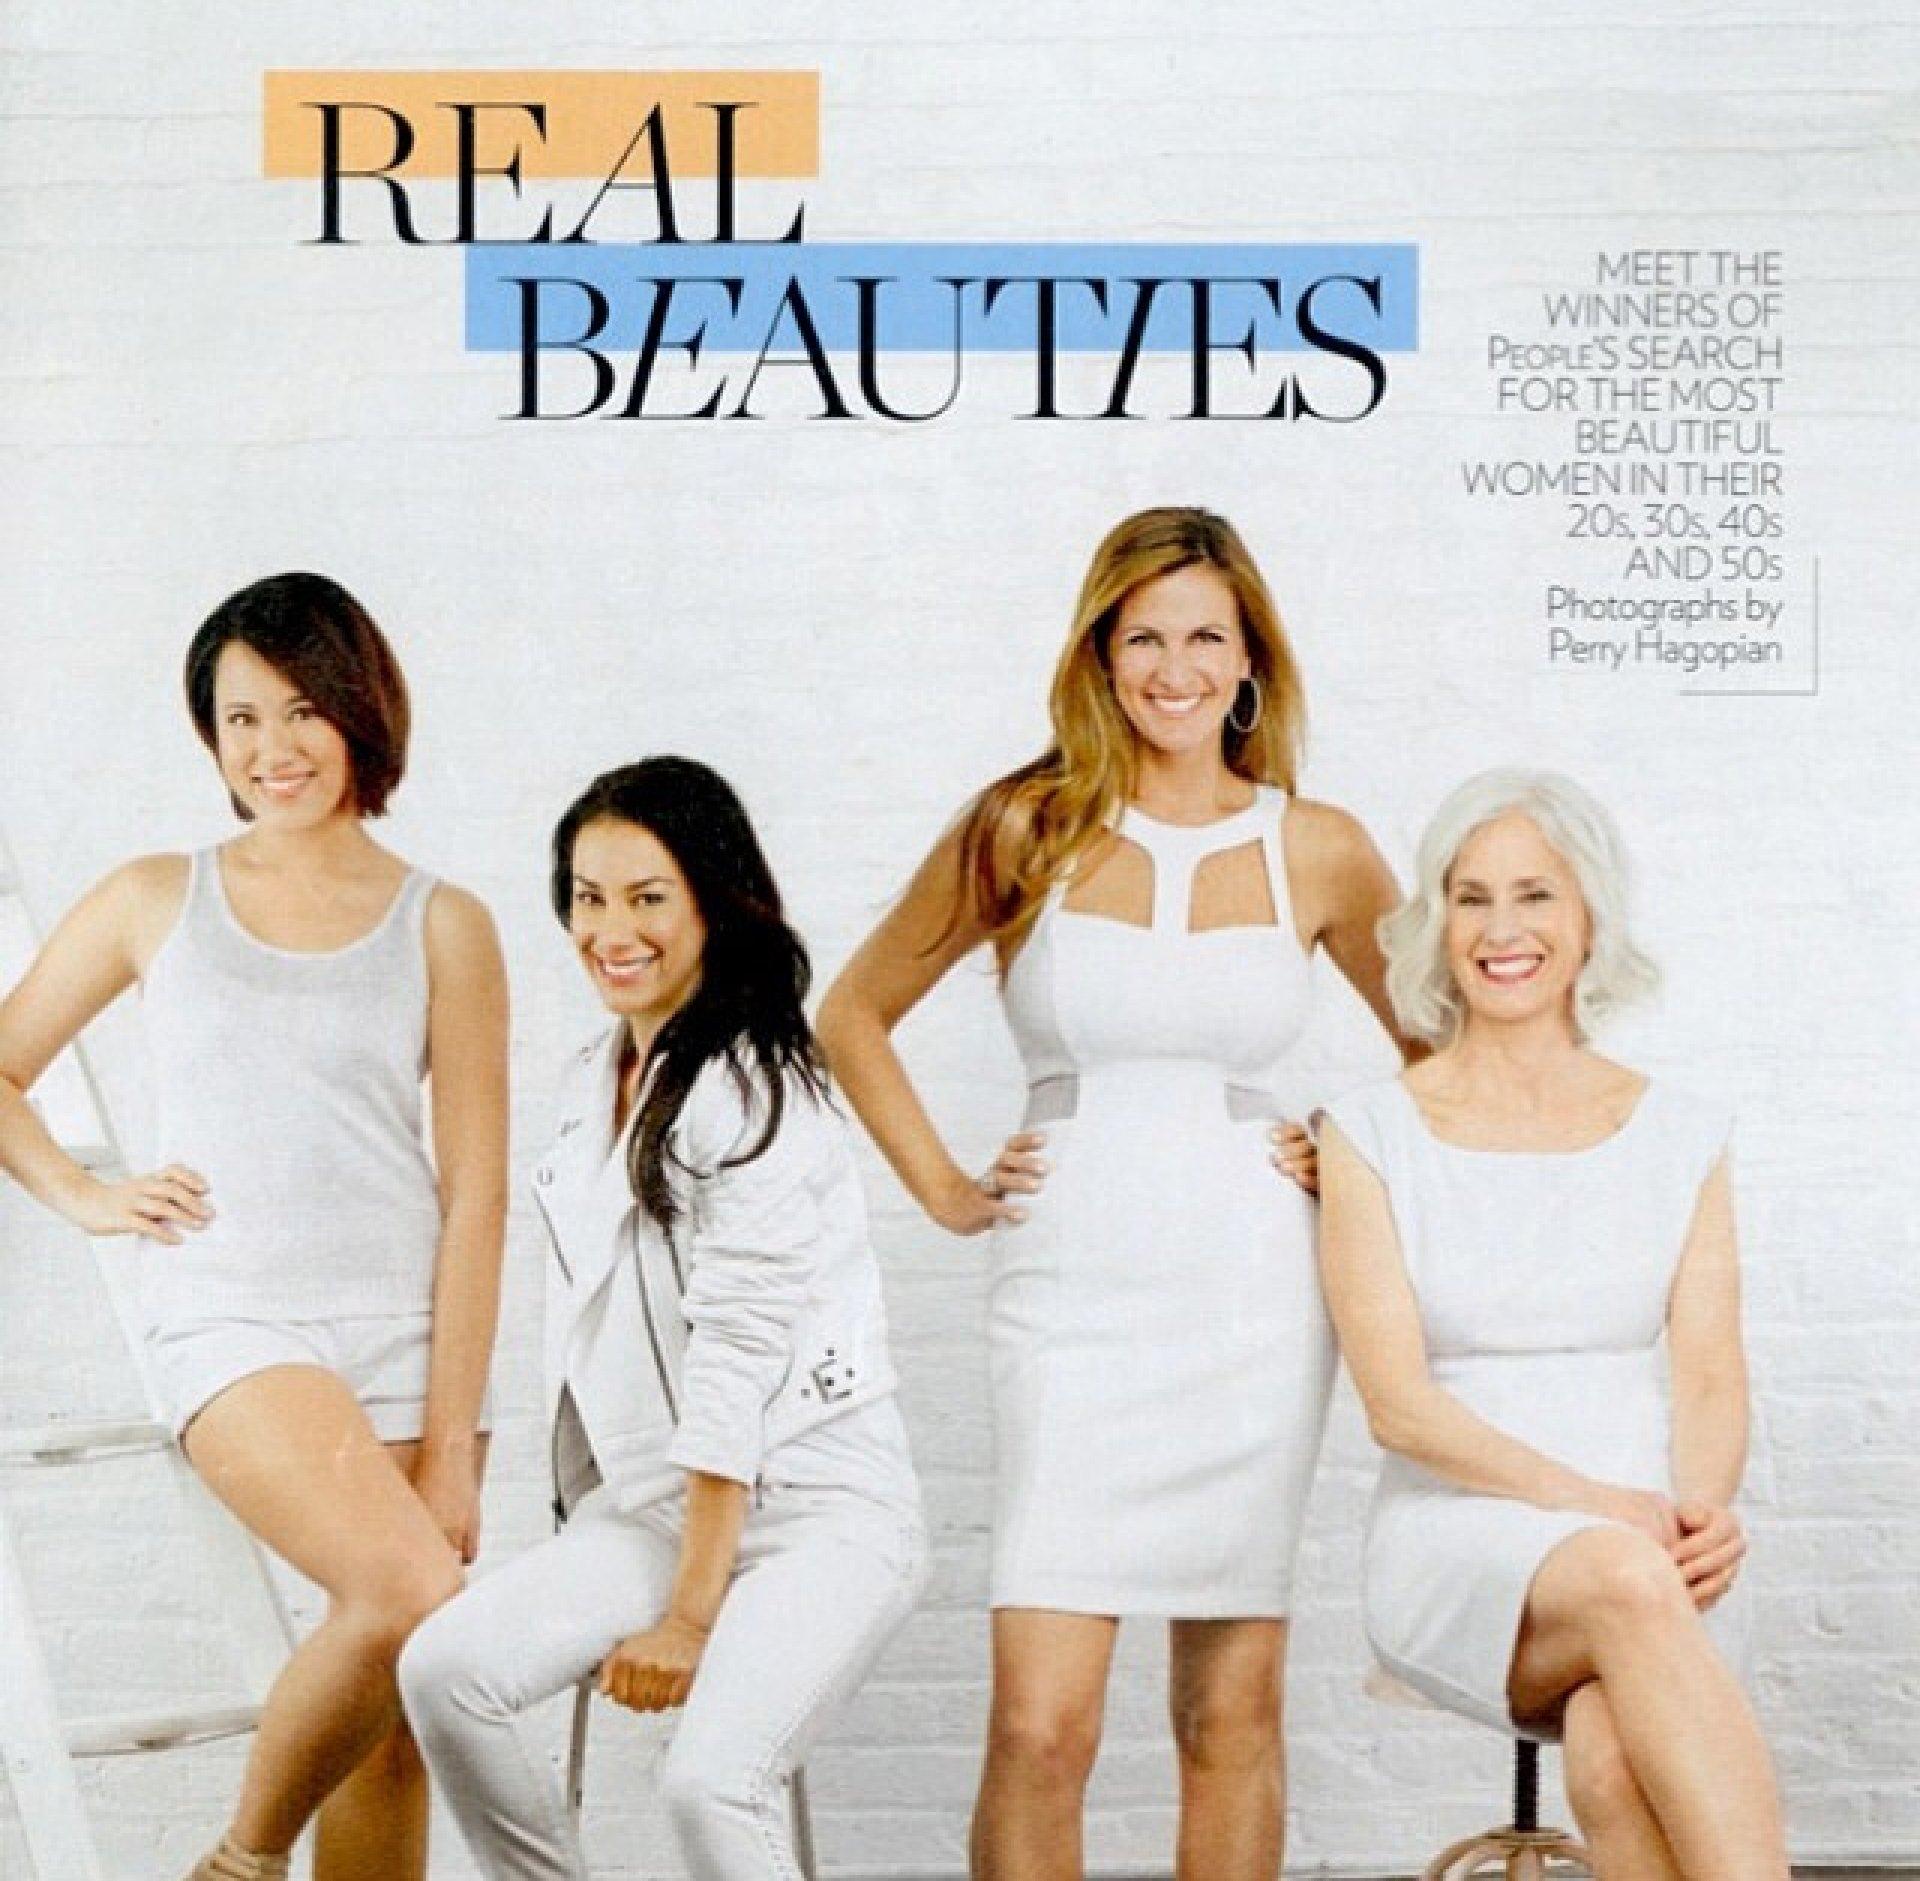 PEOPLE Magazine's 'Real Beauties'